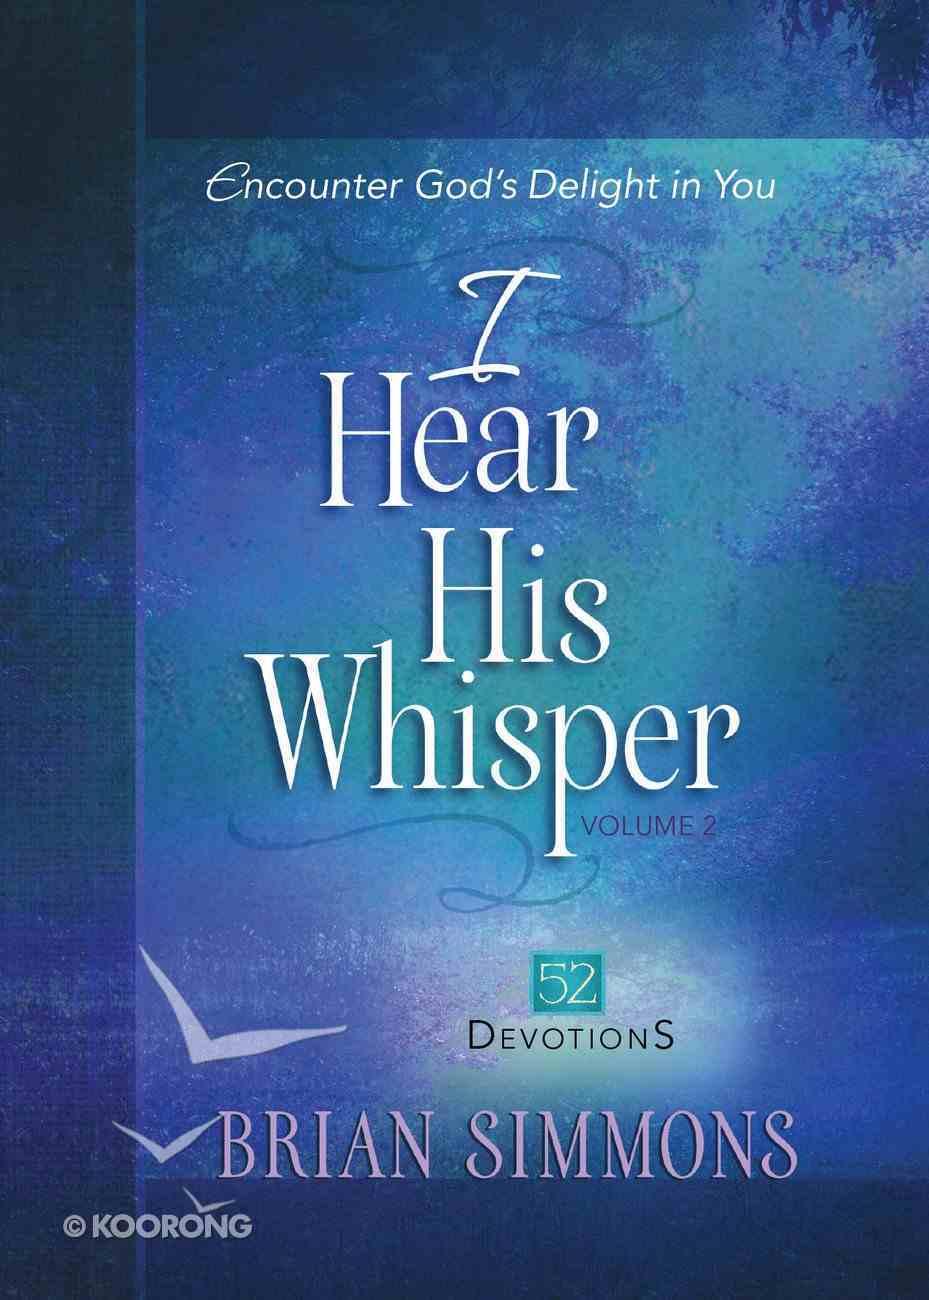 I Hear His Whisper #02: Encounter God's Delight in You (52 Devotions) eBook